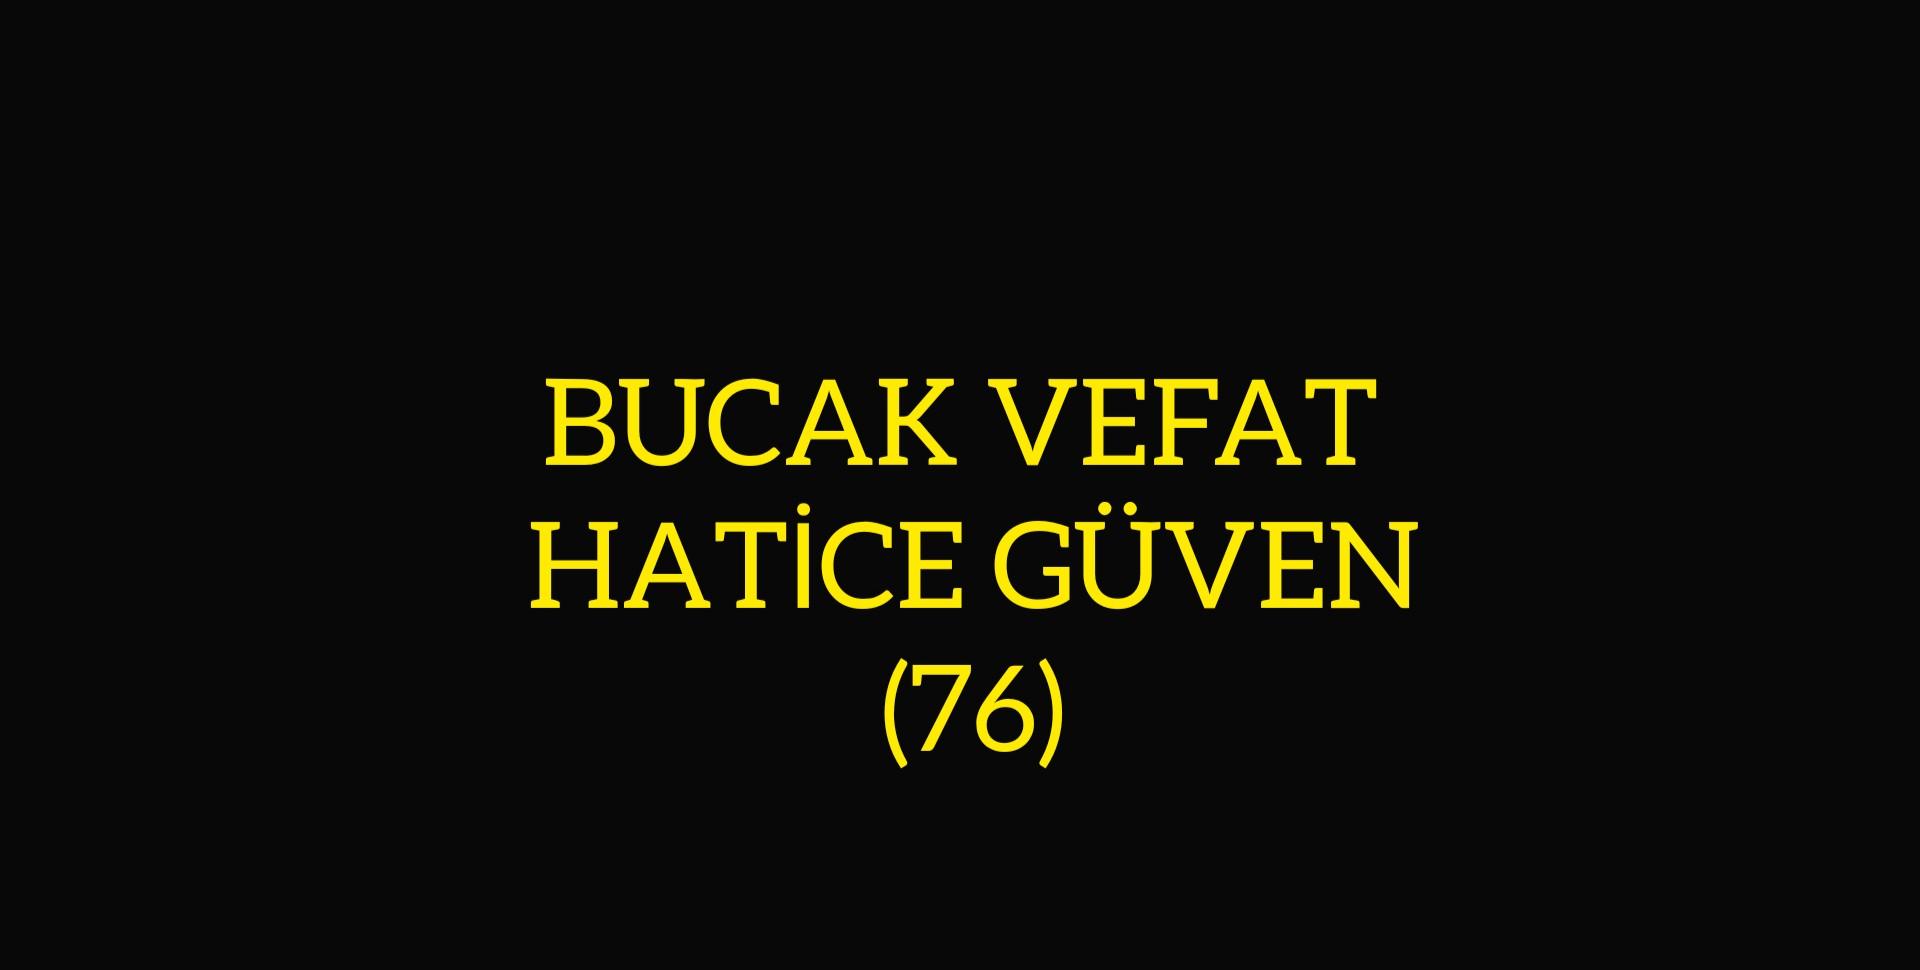 BUCAK VEFAT HATİCE GÜVEN (76)